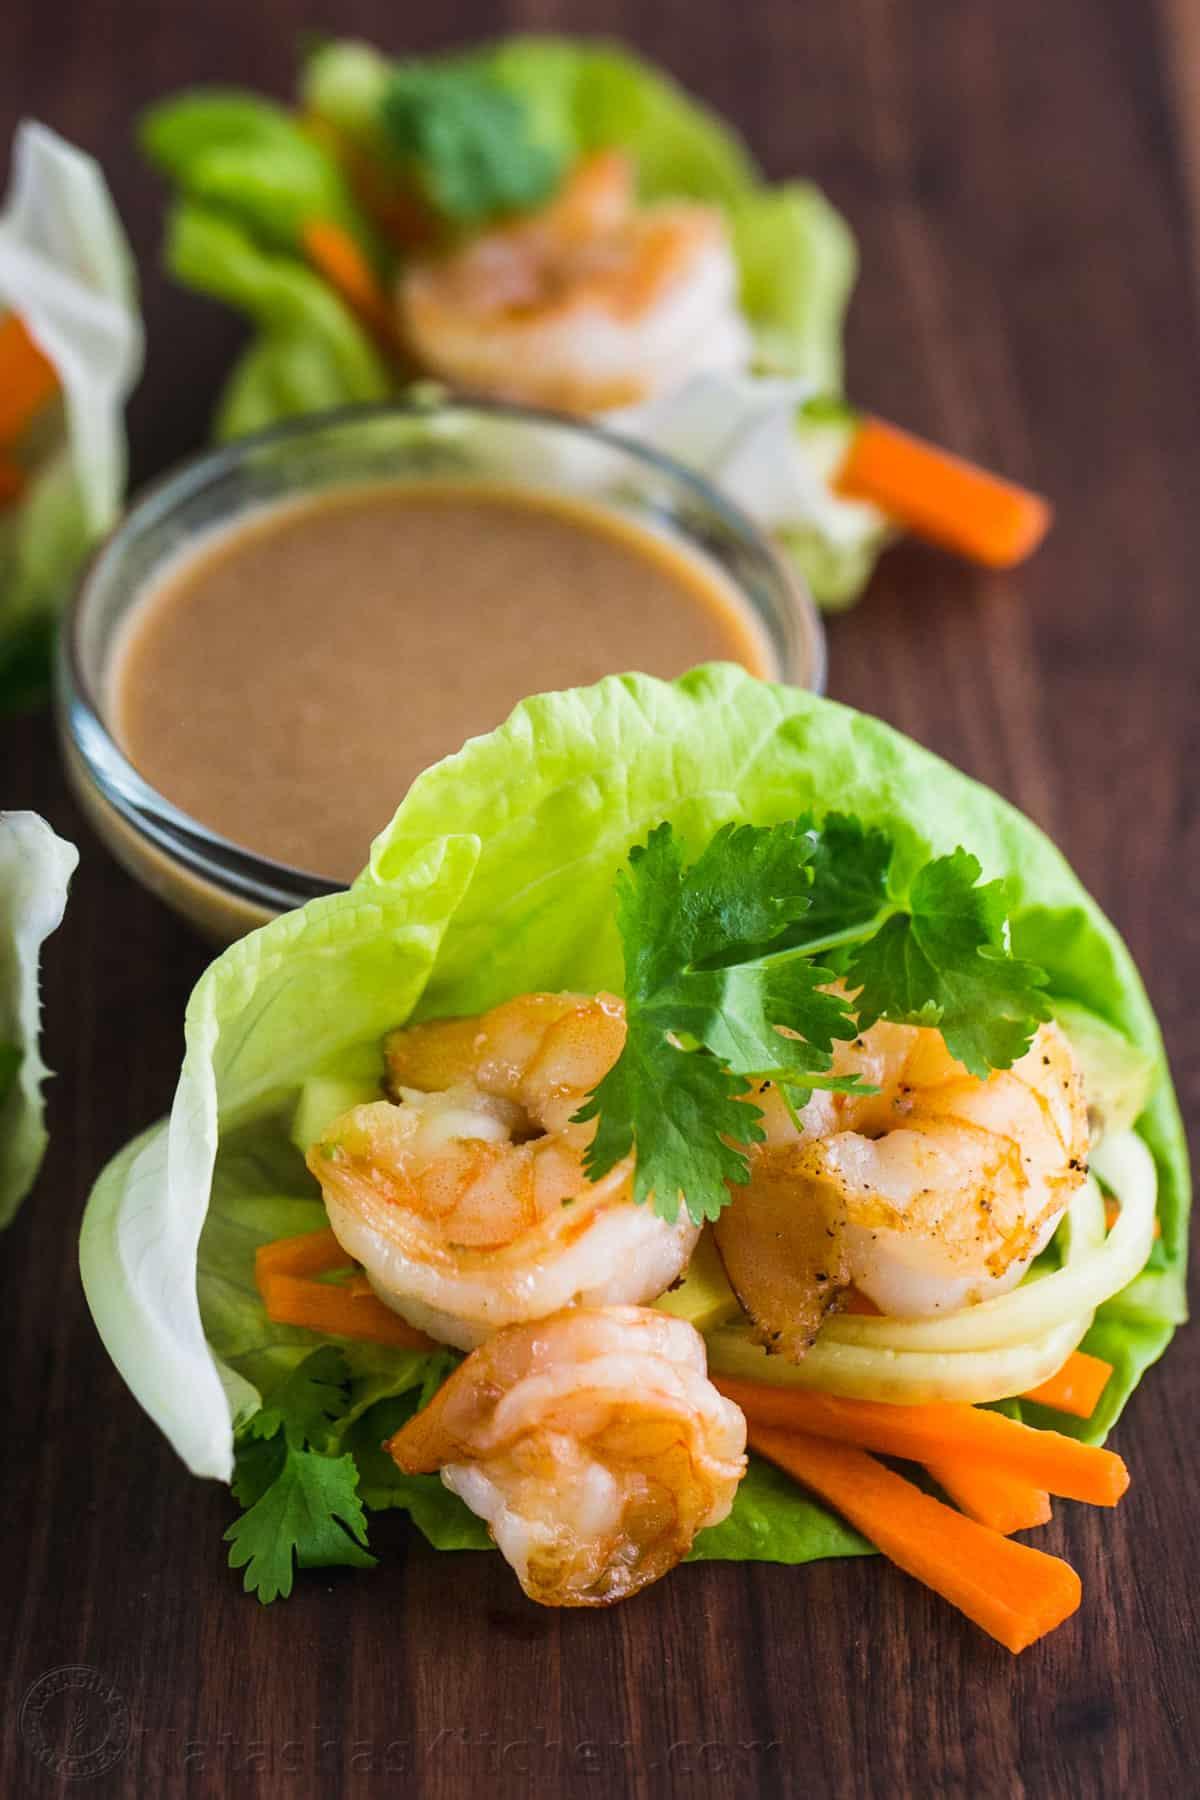 Shrimp Lettuce Wraps With Peanut Sauce Natashaskitchen Com